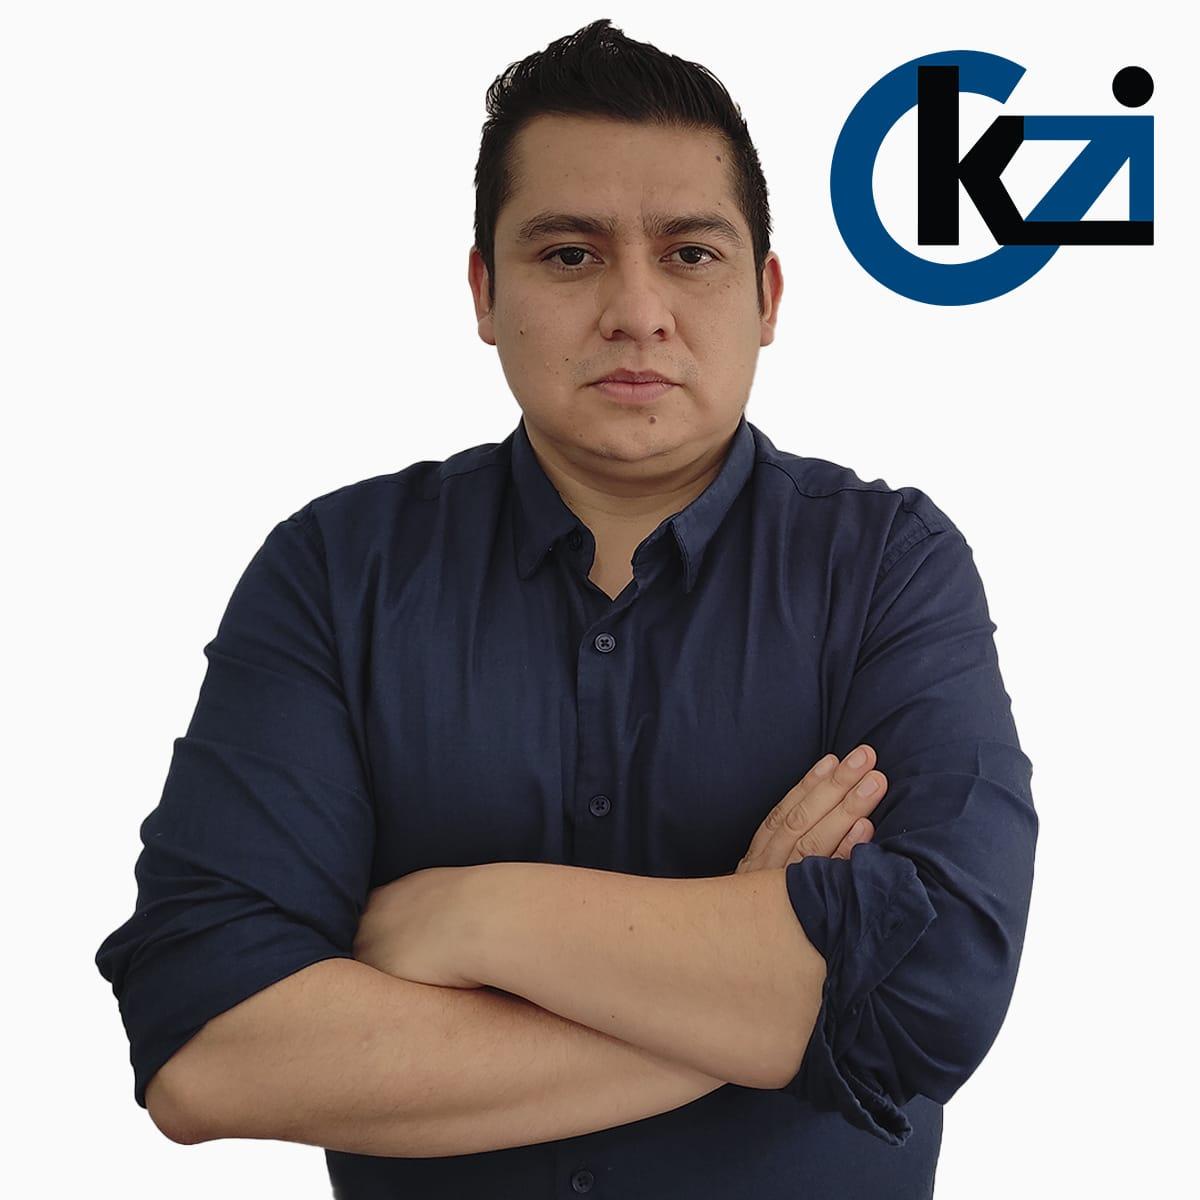 Omar Lugo Sáchez